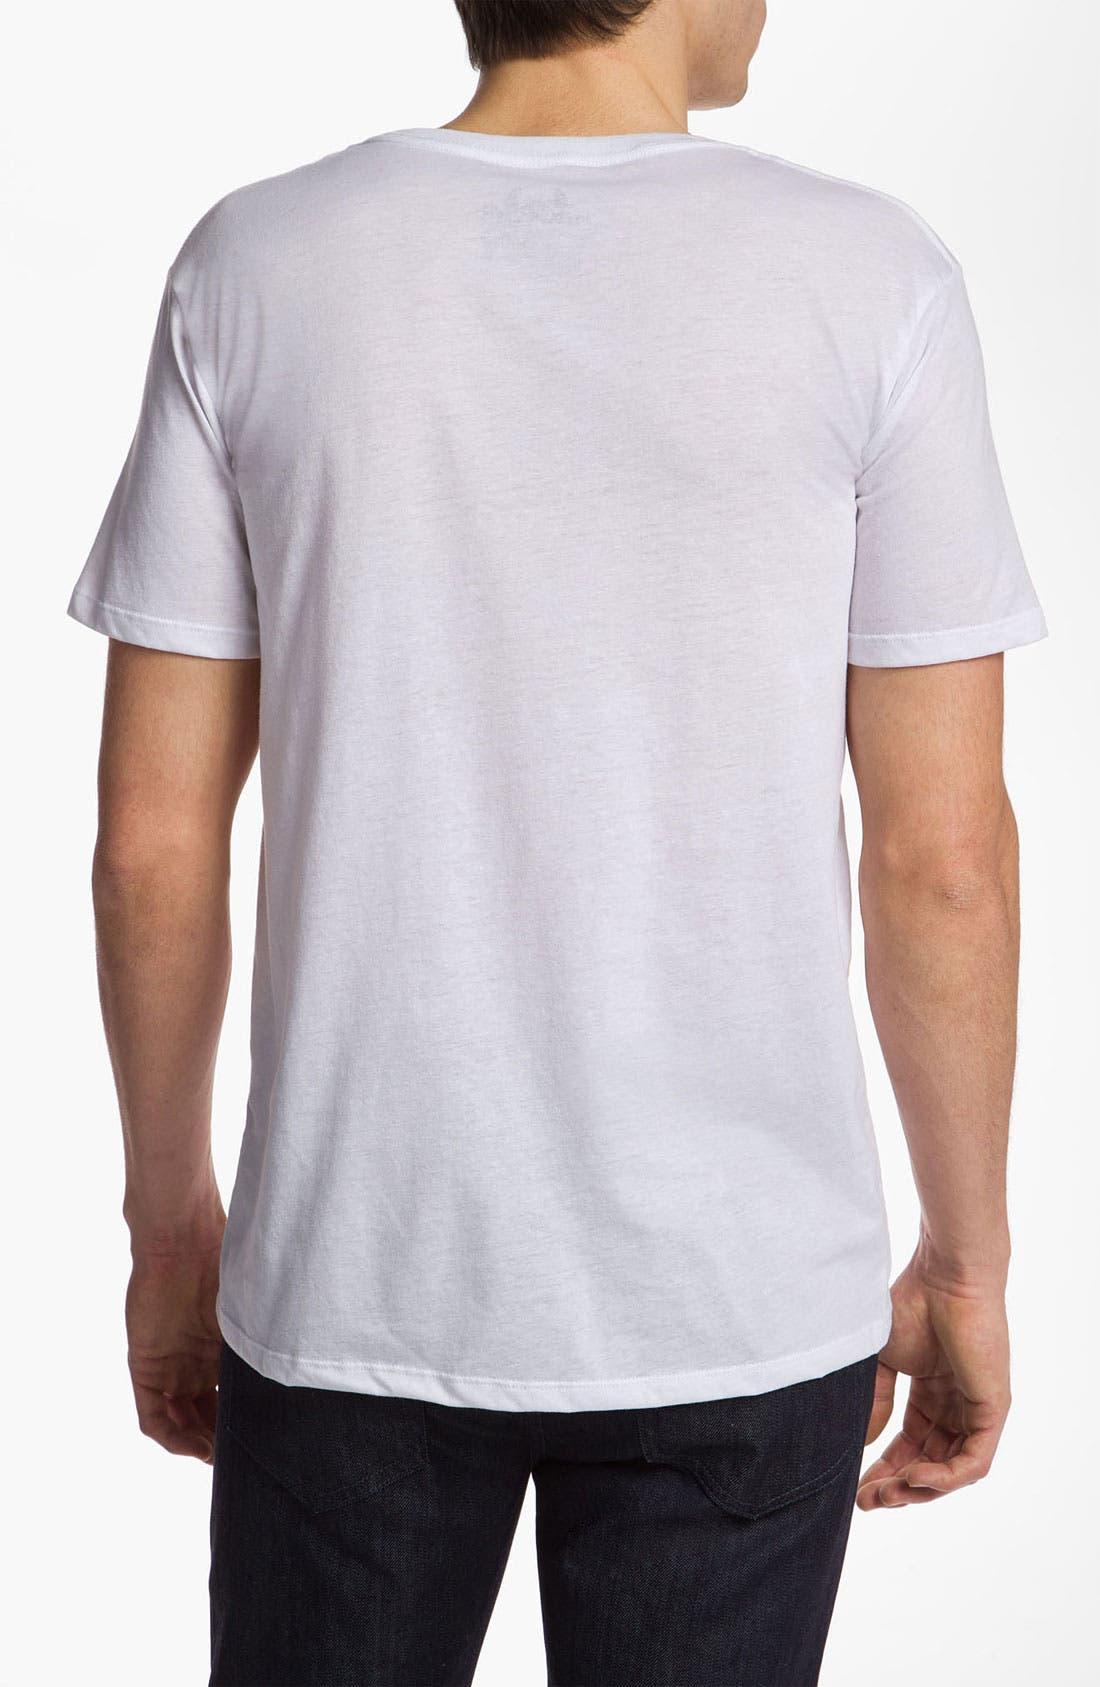 Alternate Image 2  - Headline Shirts 'North Pole Vacation' T-Shirt